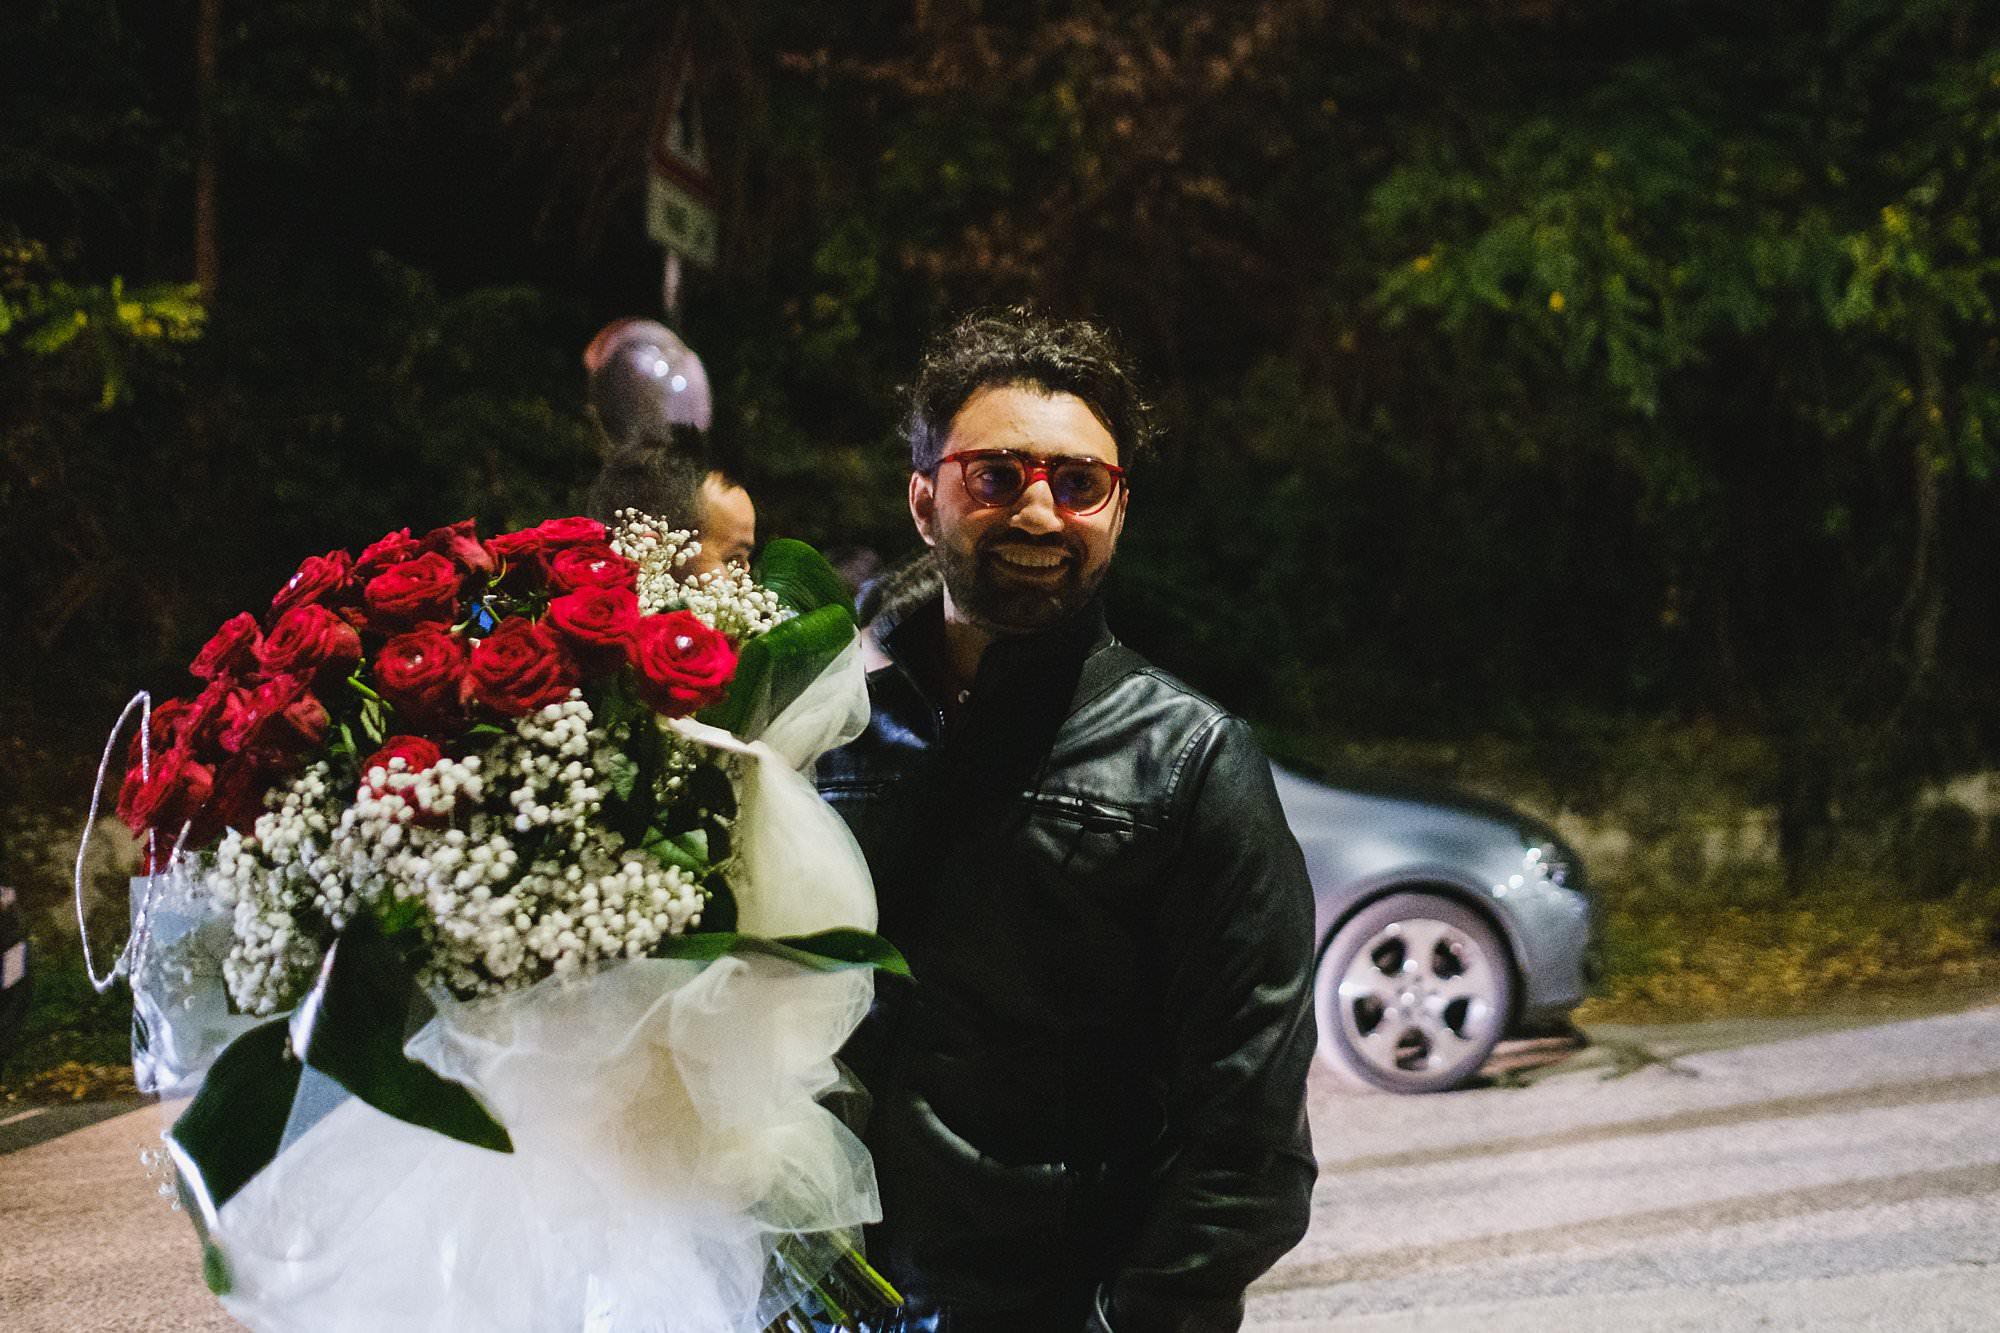 destination wedding photographer italy rg1 012 - Roberta + Giuseppe Part 1 | Italy Wedding Photography